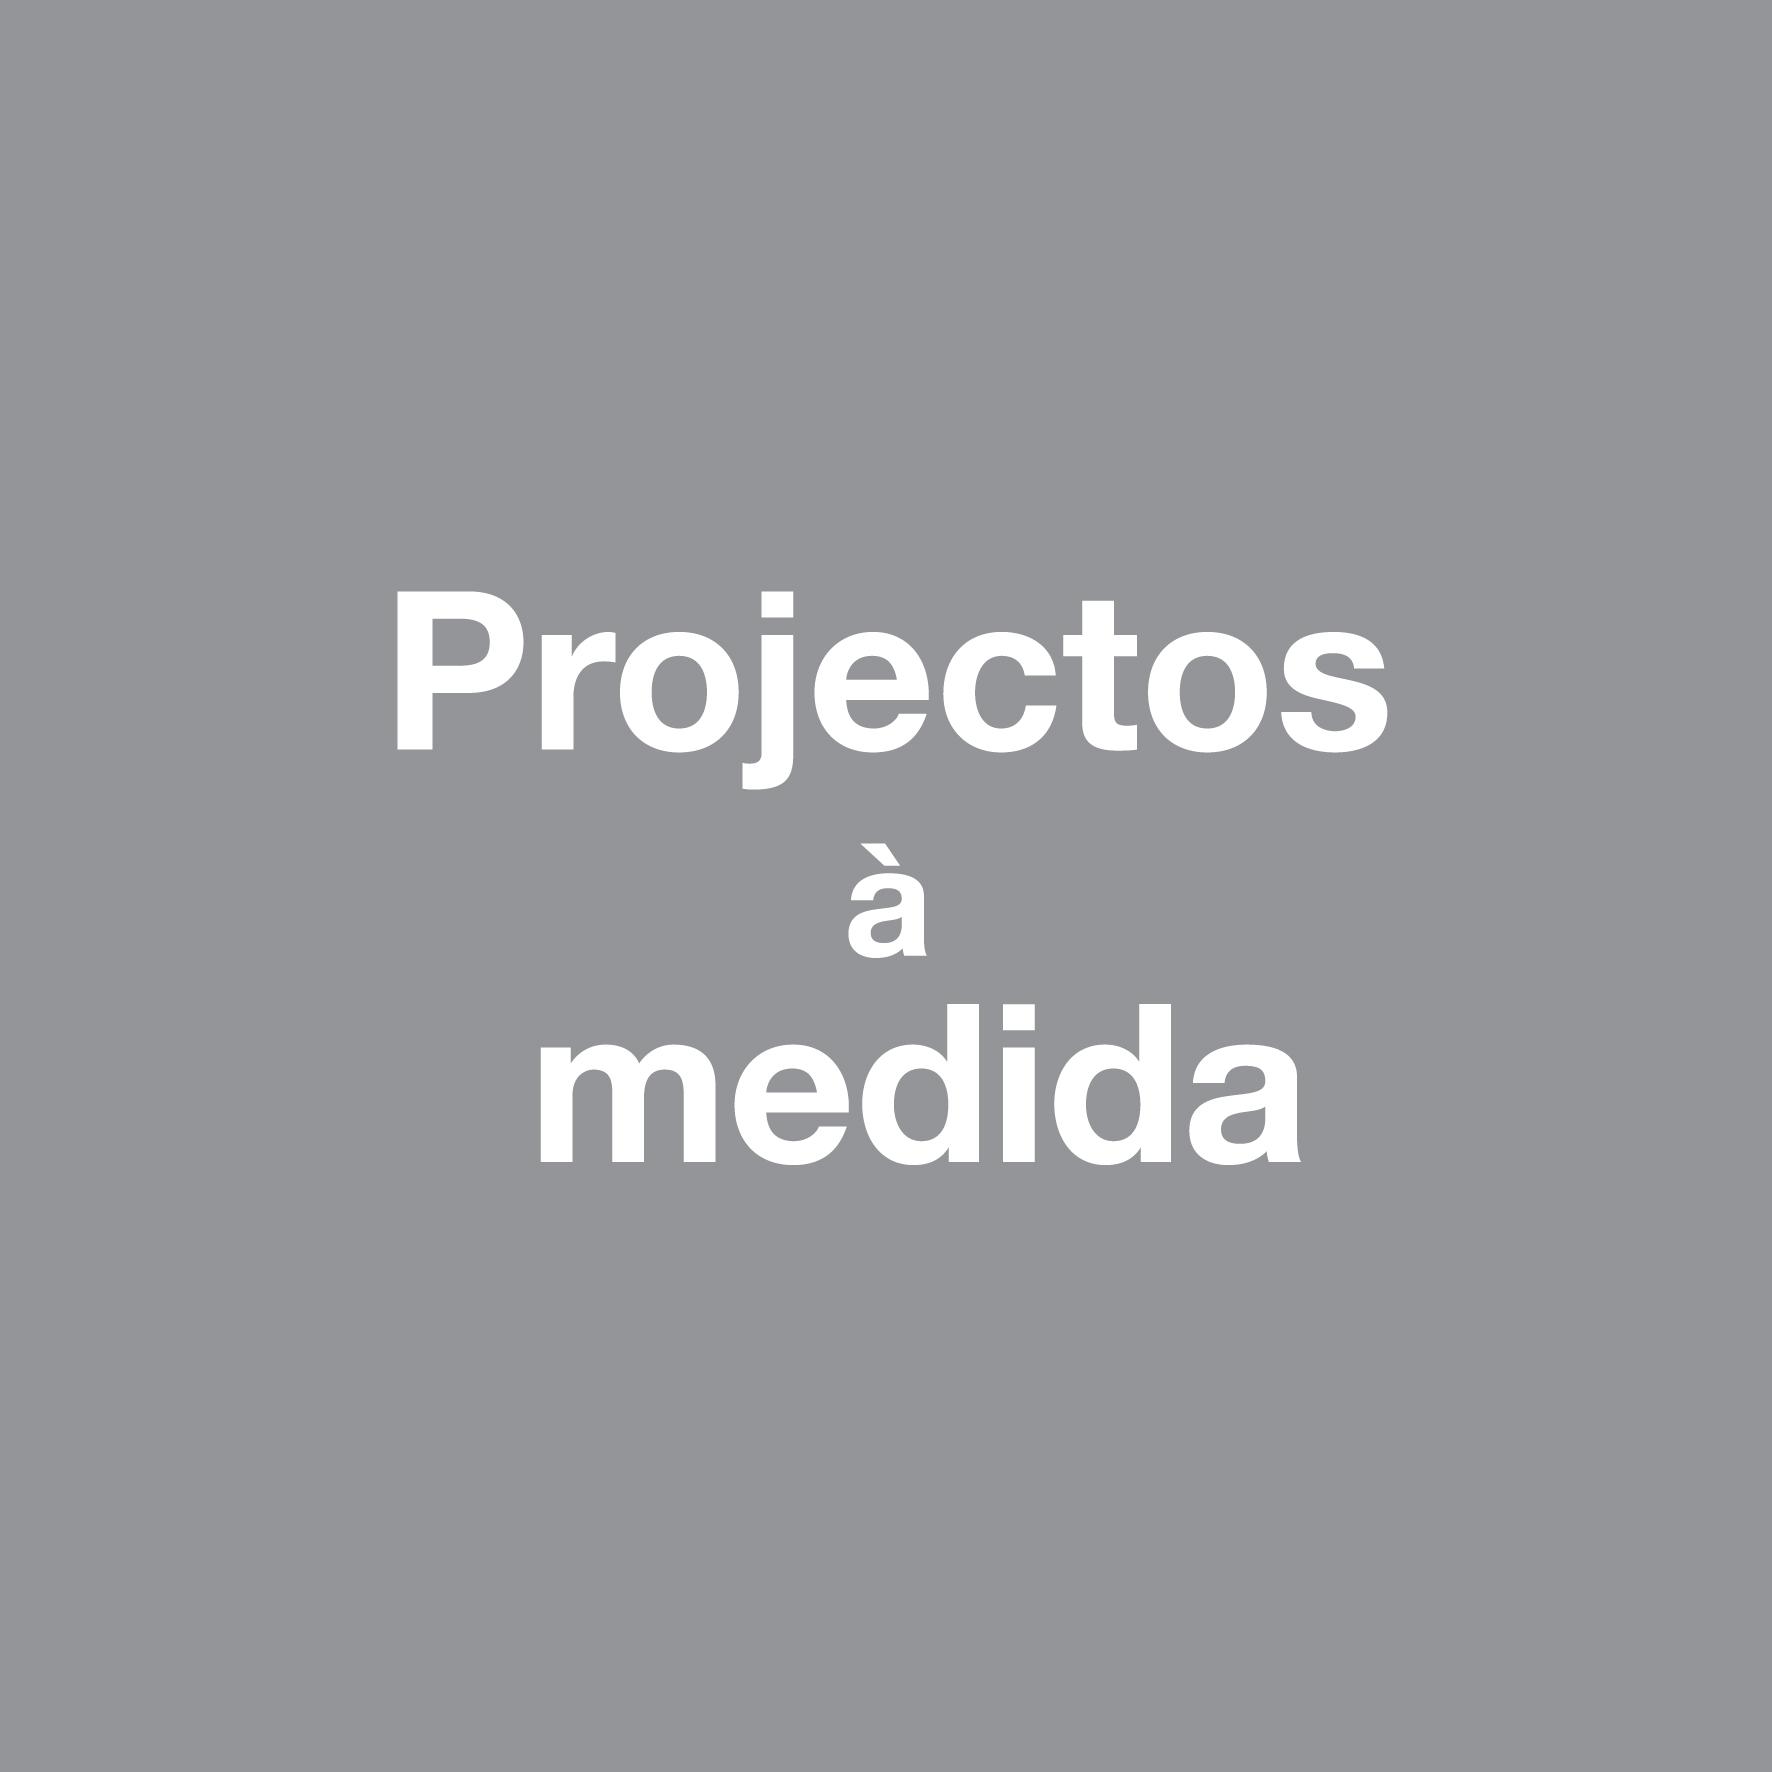 projecto-a-medida